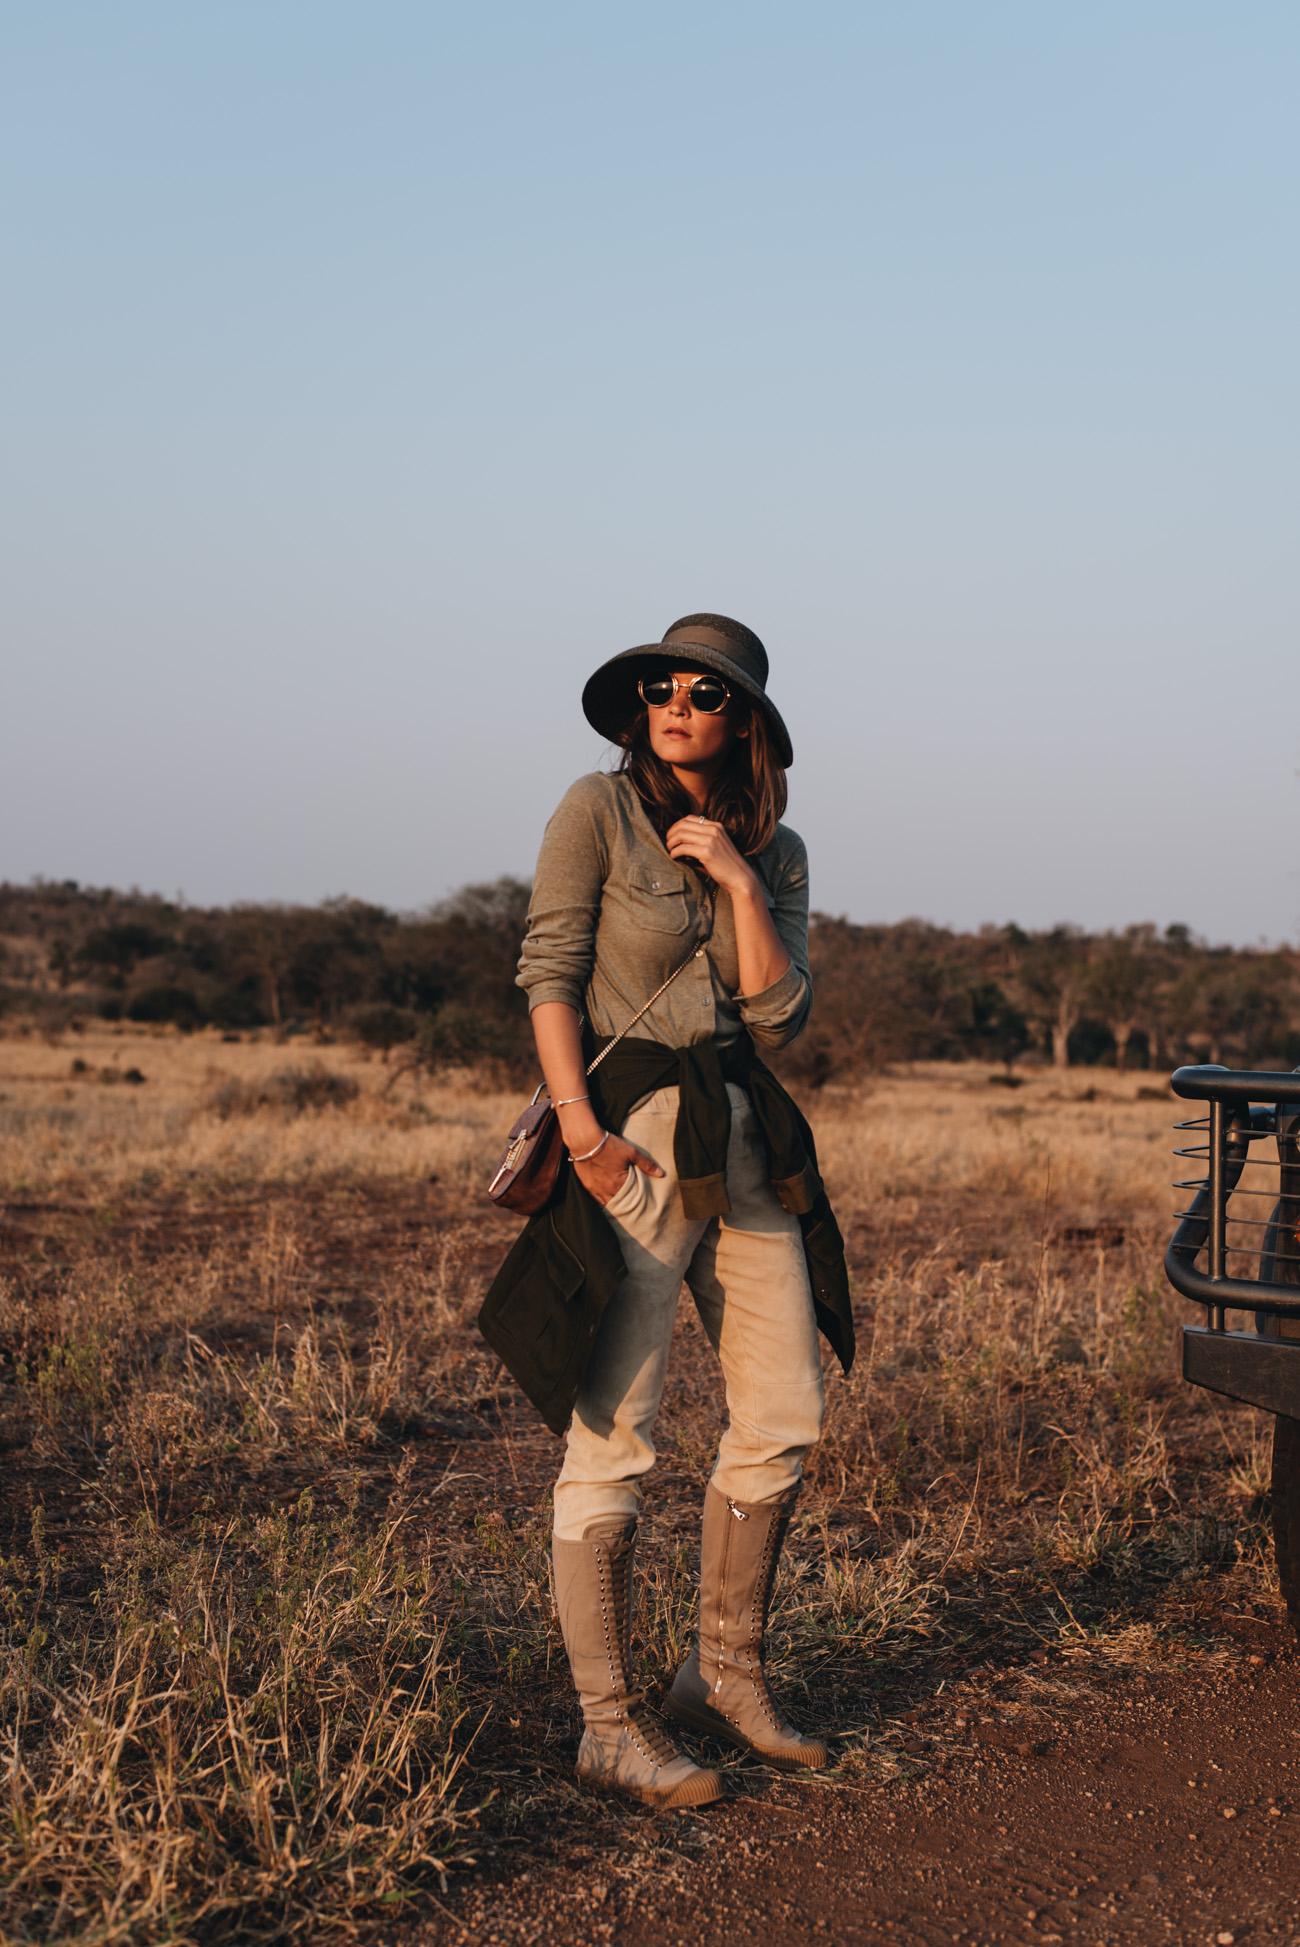 afrika-safari-pauschalreise-singita-krüger-nationalpark-nina-schwichtenberg-fashiioncarpet